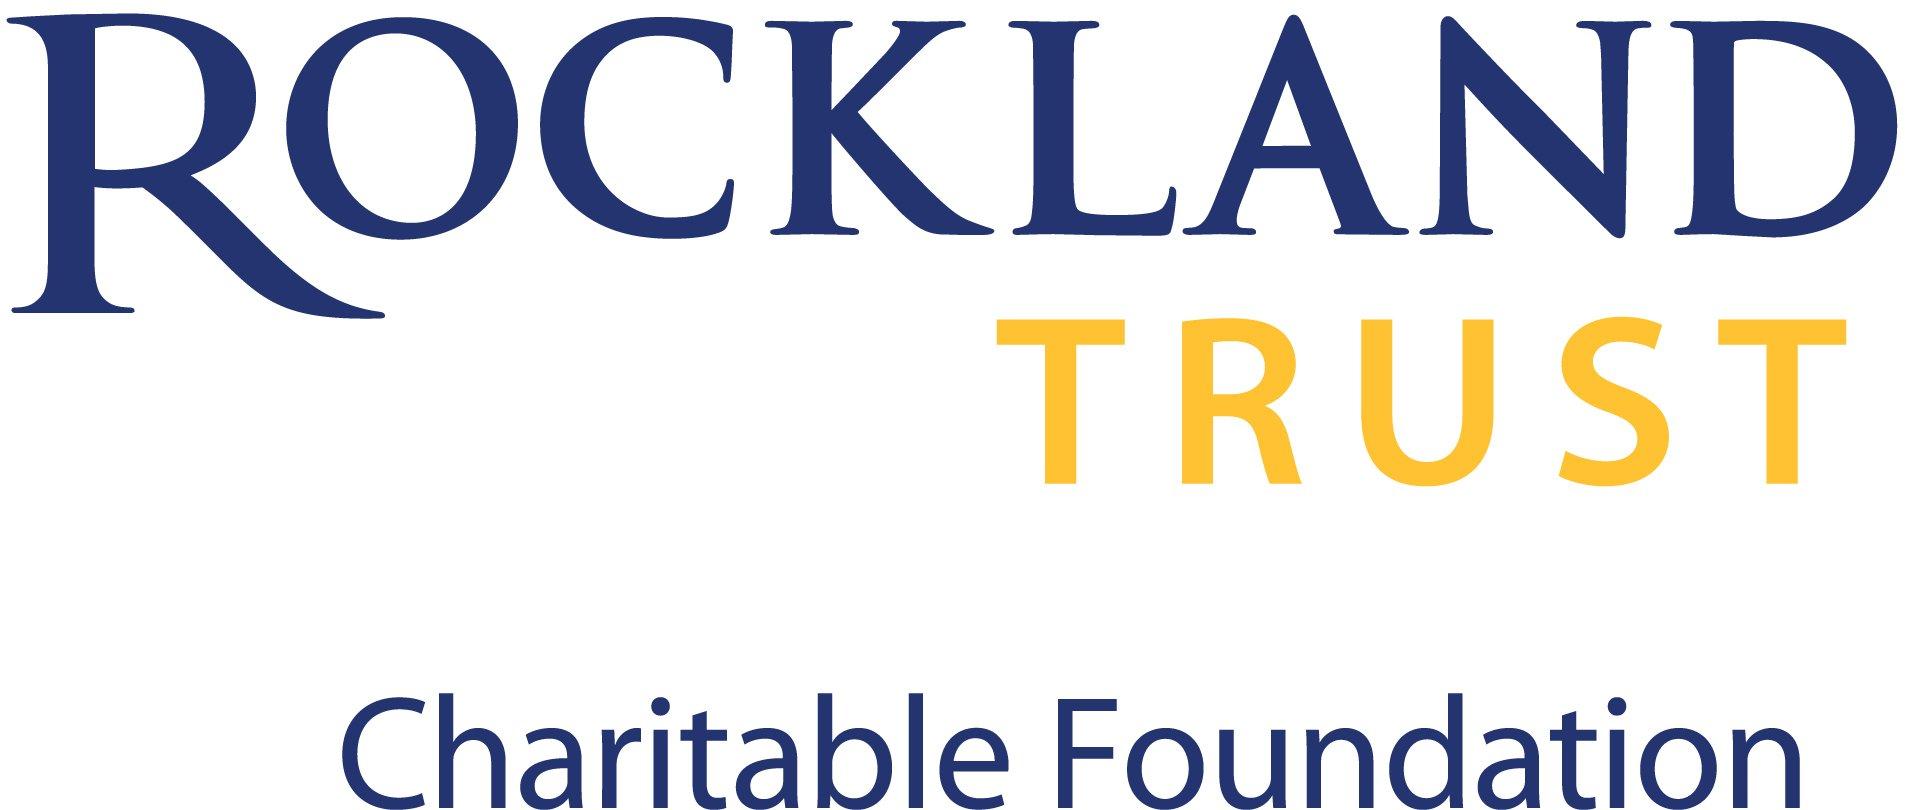 Rockland Trust Charitable Foundation